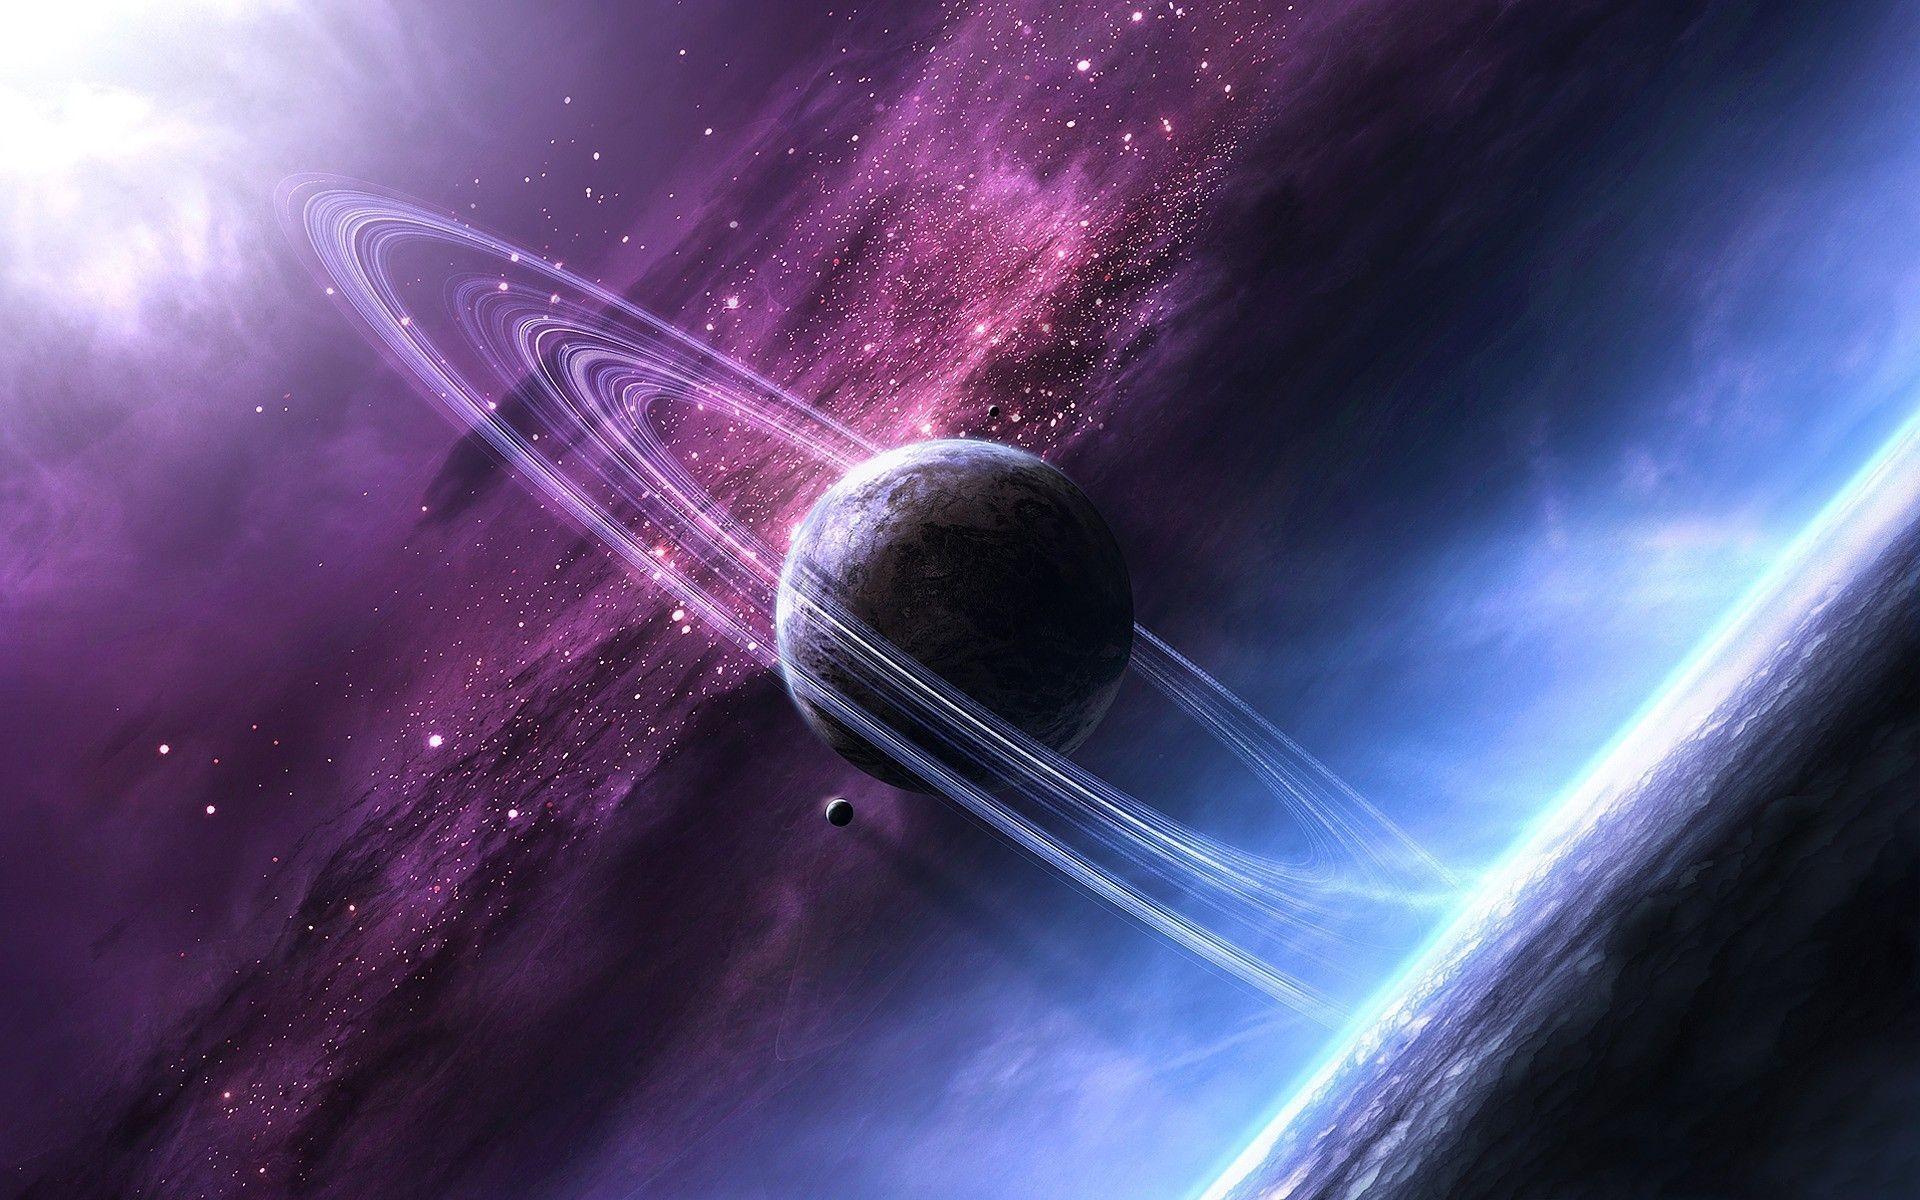 Saturn Wallpaper ·① Download Free Beautiful HD Backgrounds